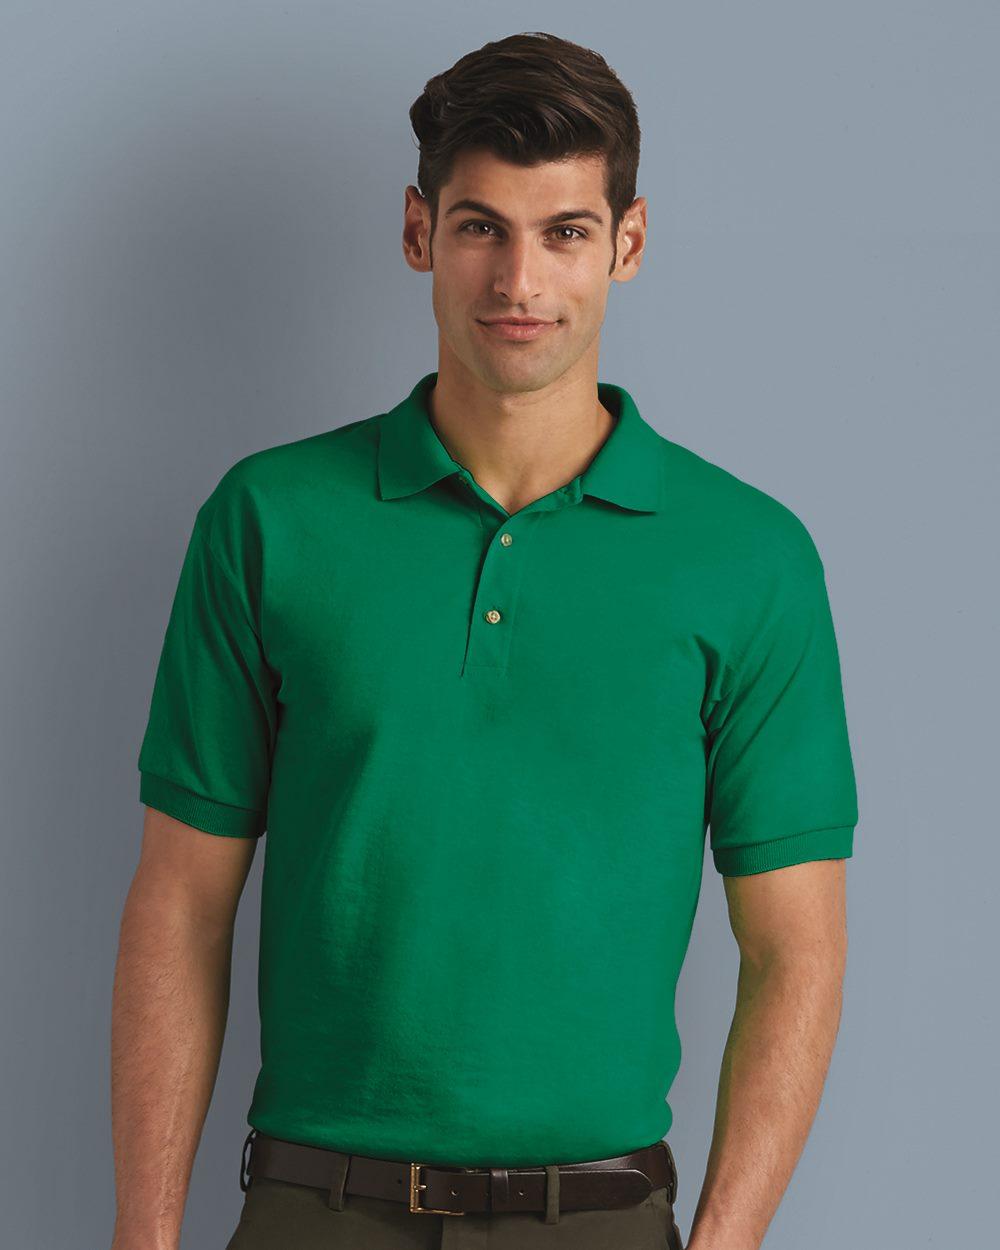 a27da0bf431 Gildan Dryblend Long Sleeve Shirts